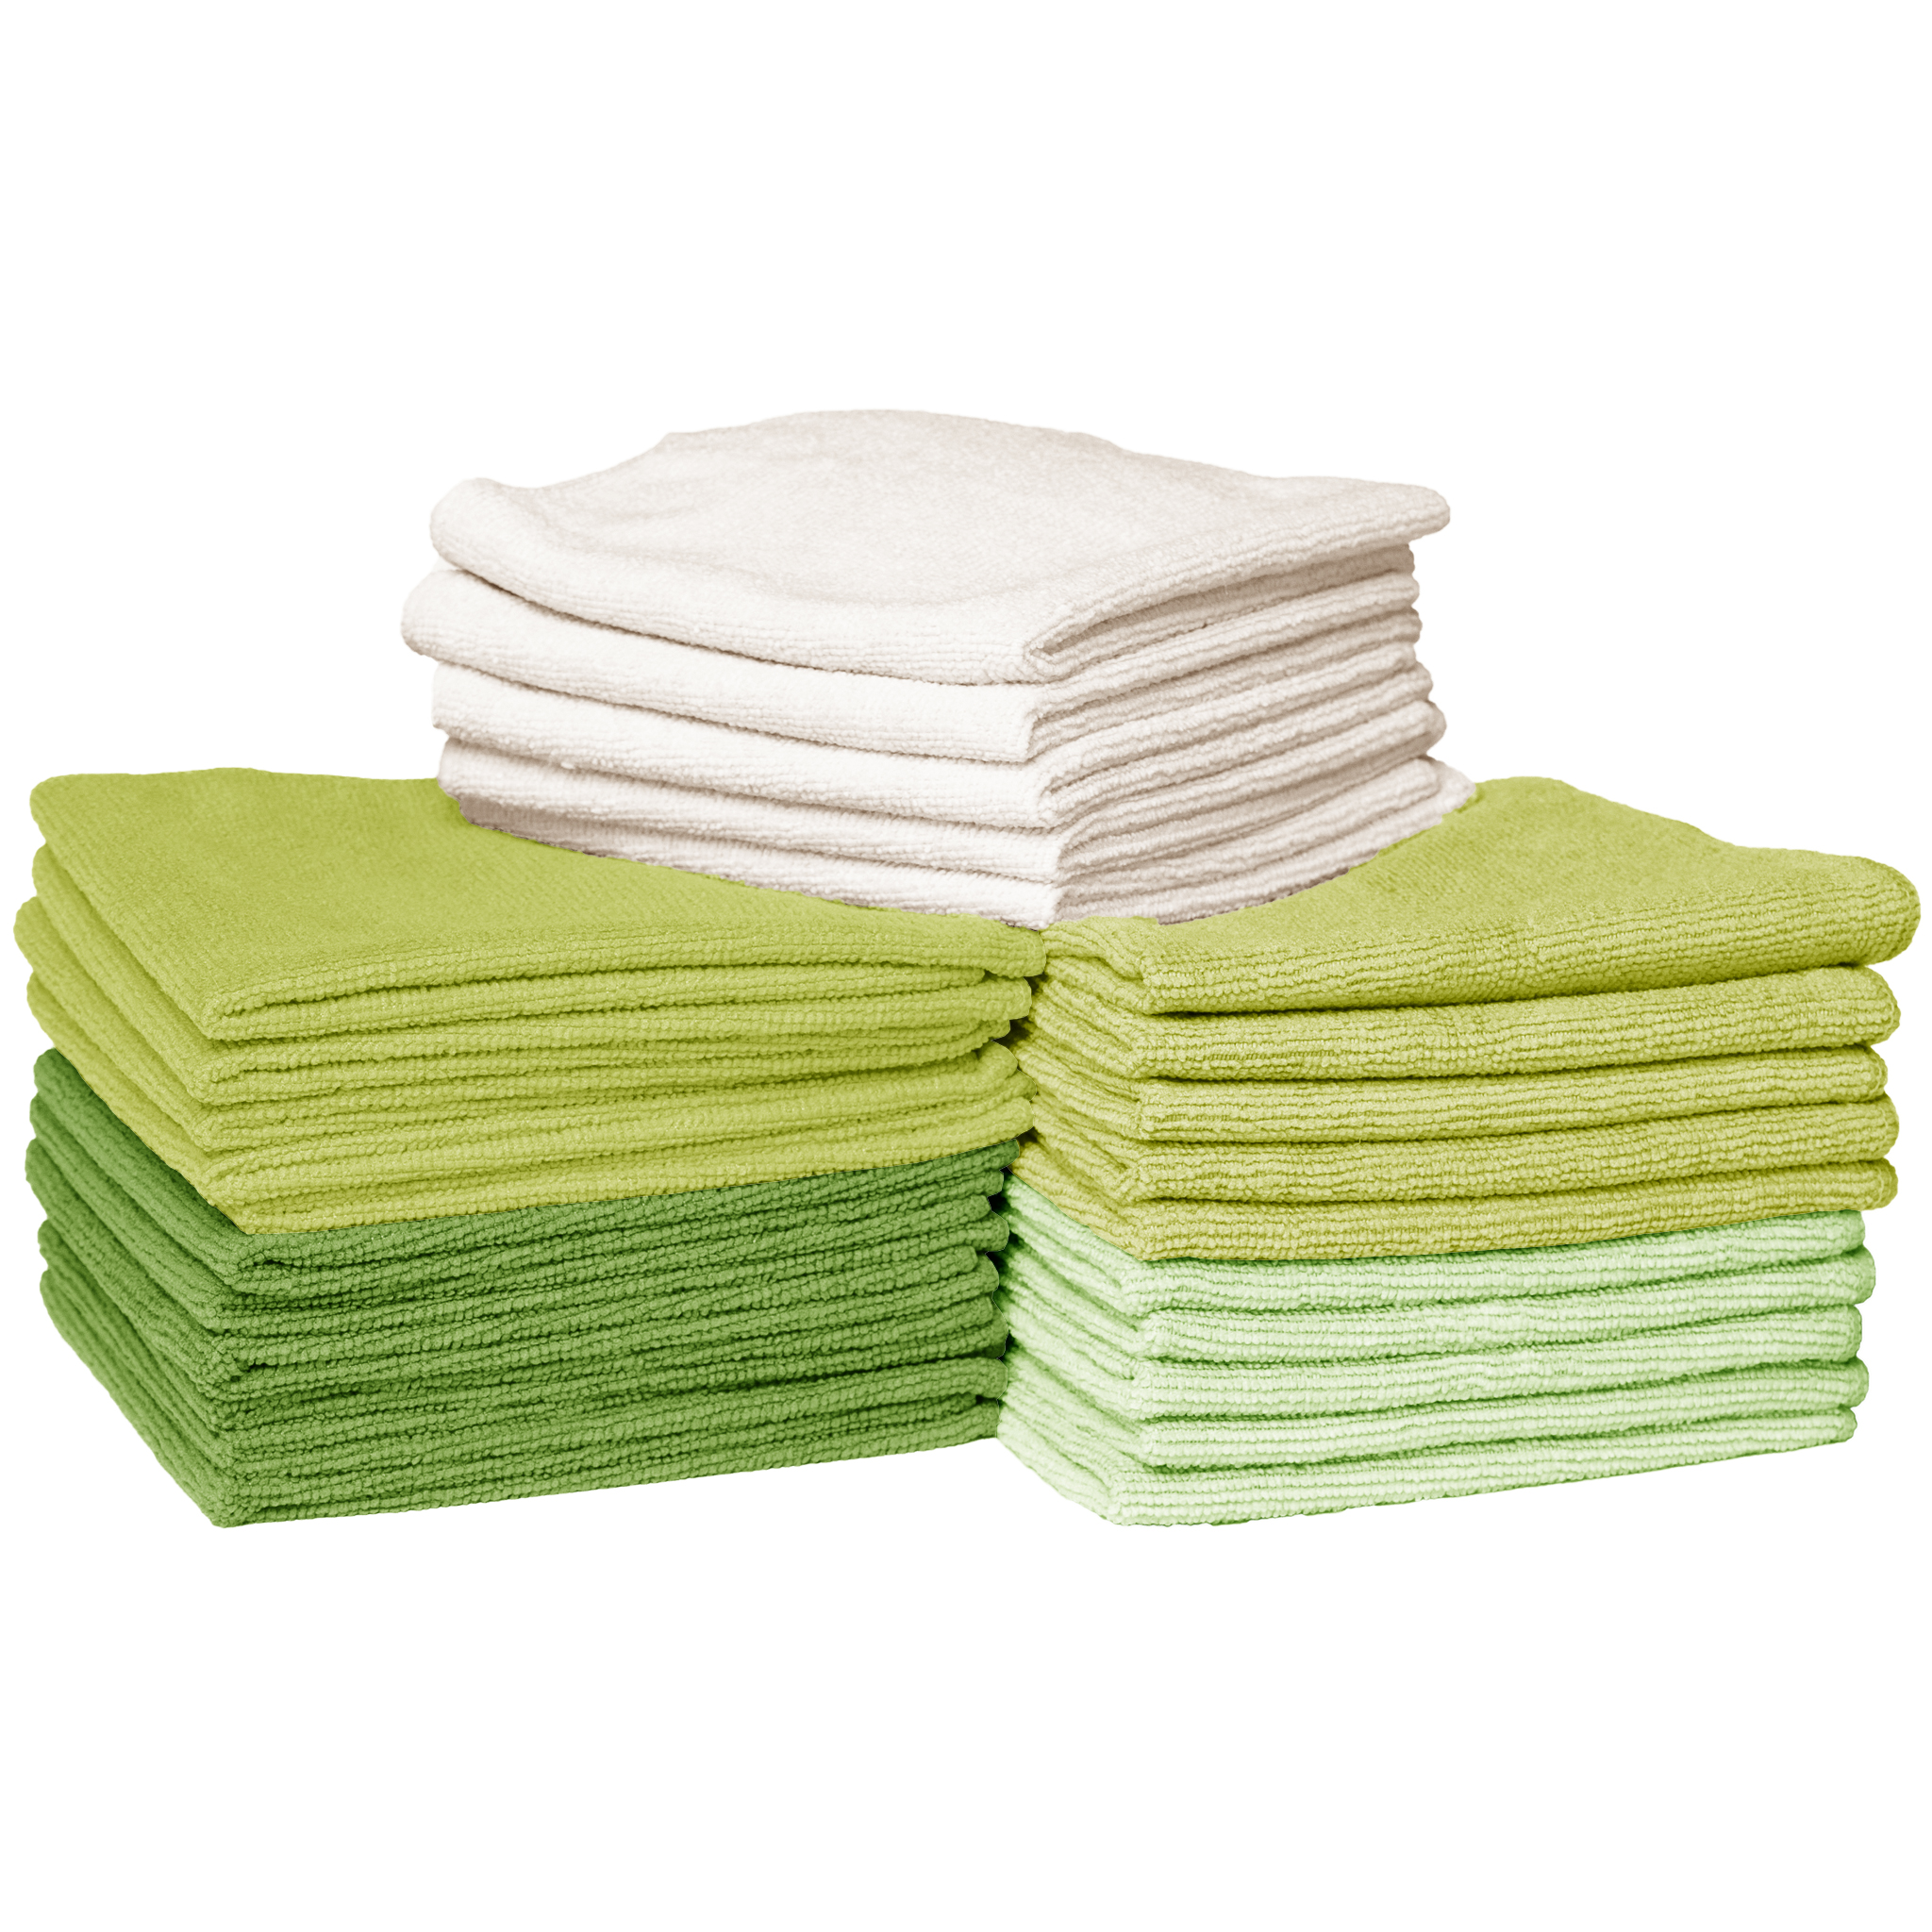 25pc-Microfiber-Towel-Olive-Grove.jpg